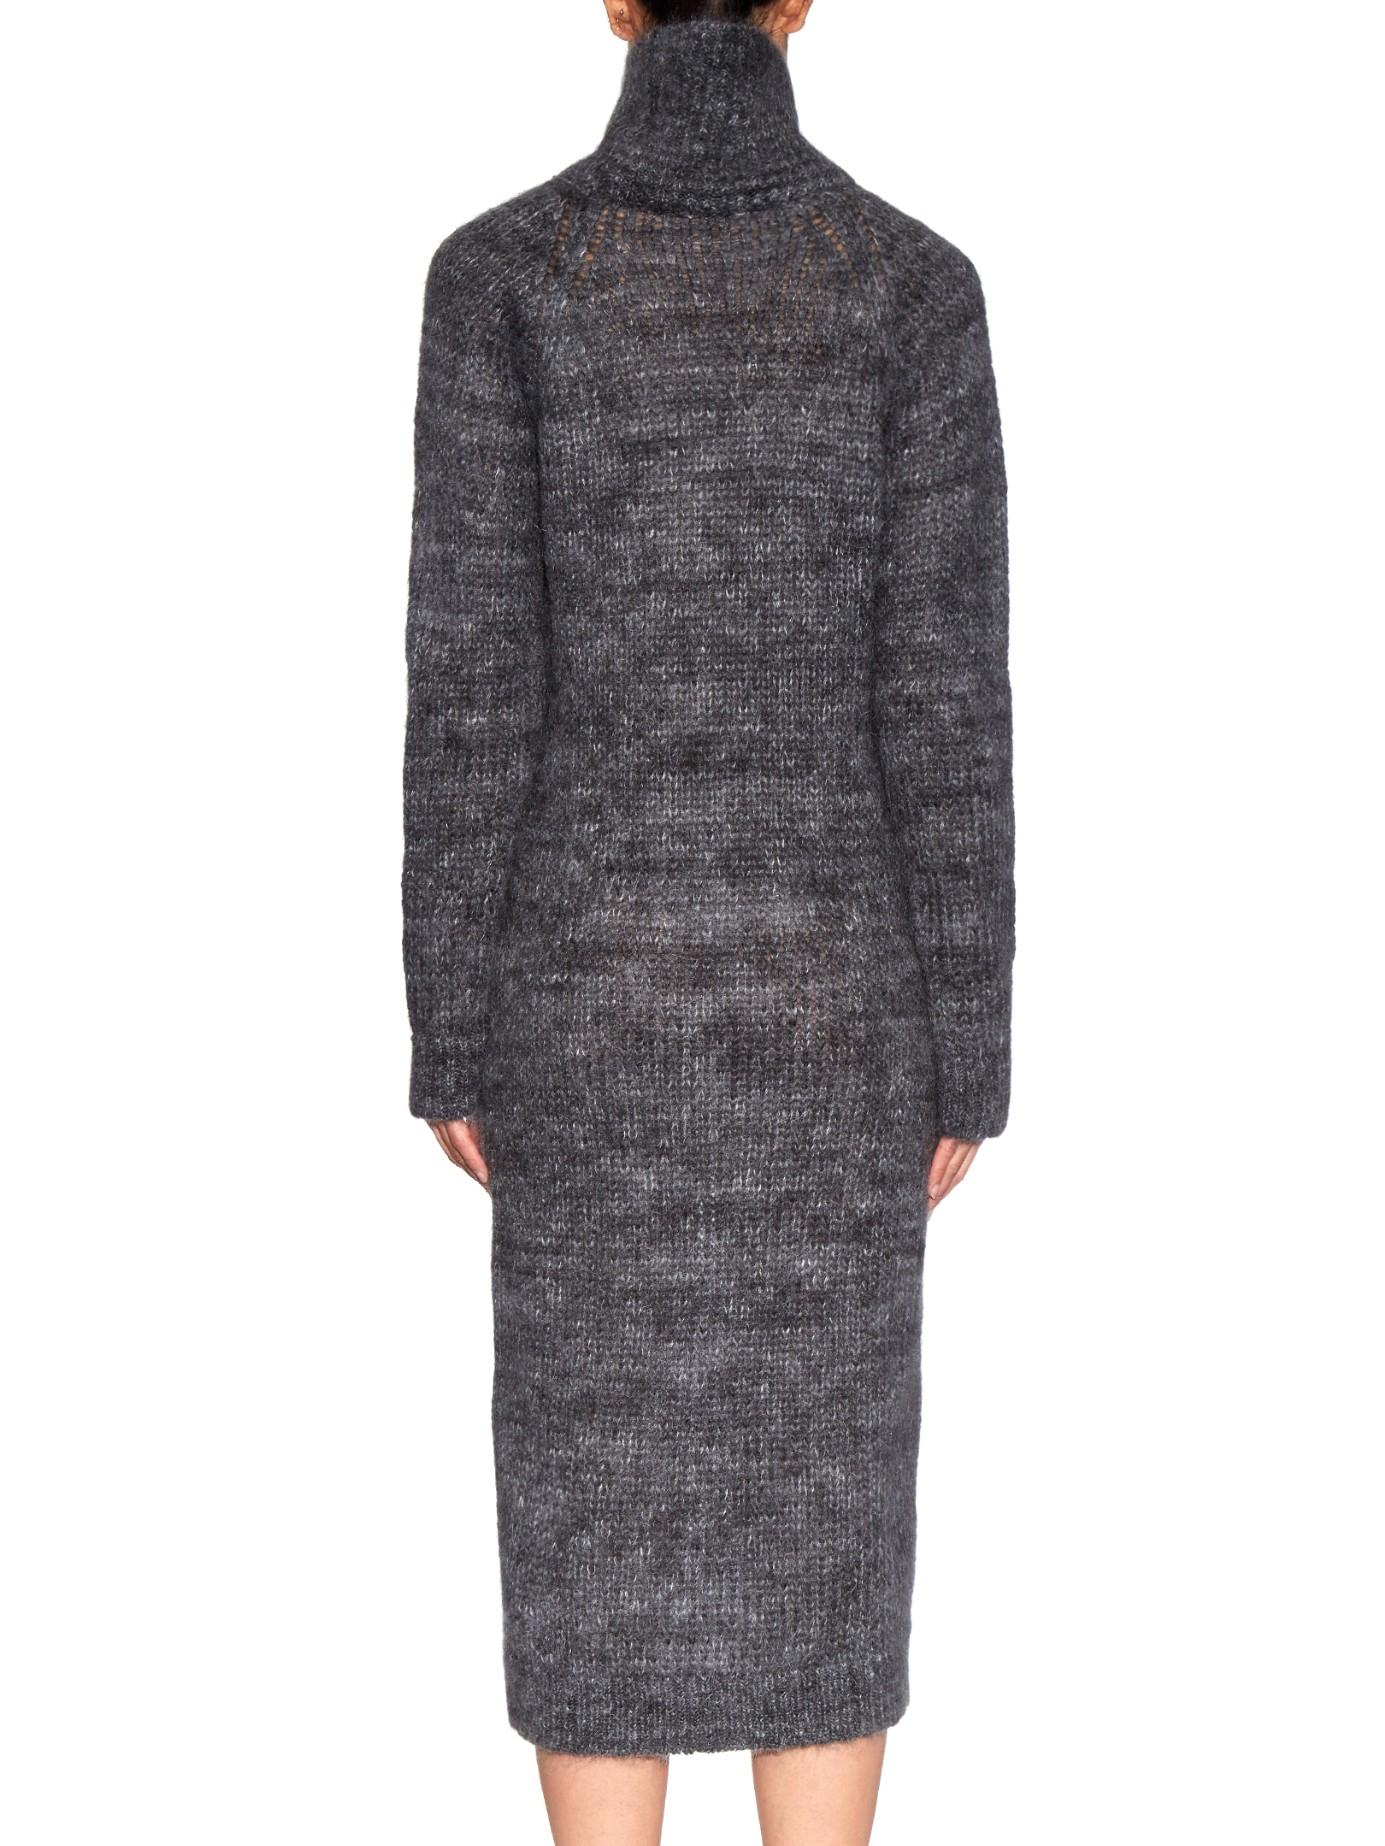 Raey Marl-knit Mohair-blend Midi Dress in Gray Lyst